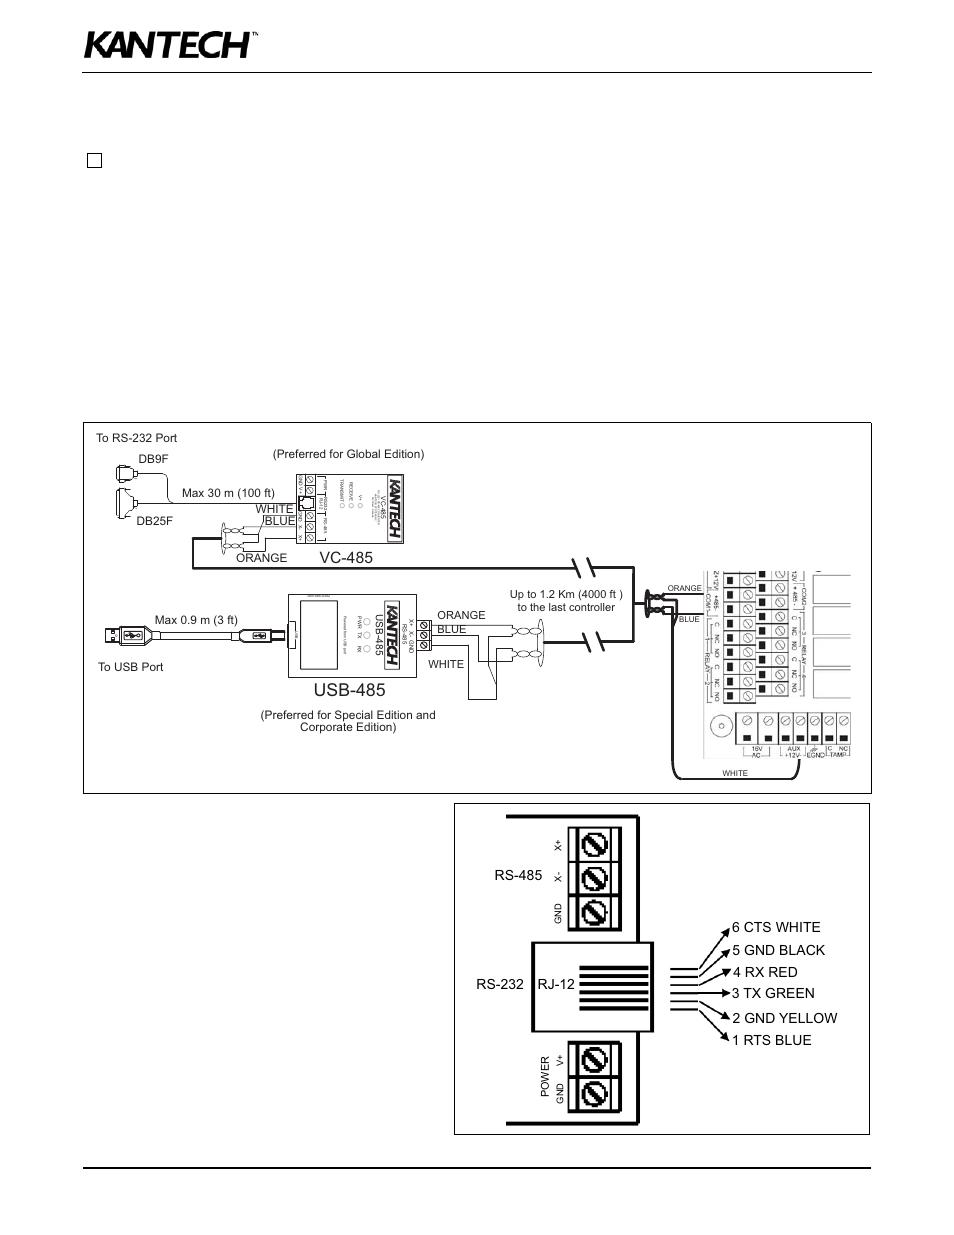 Kantech USB-485